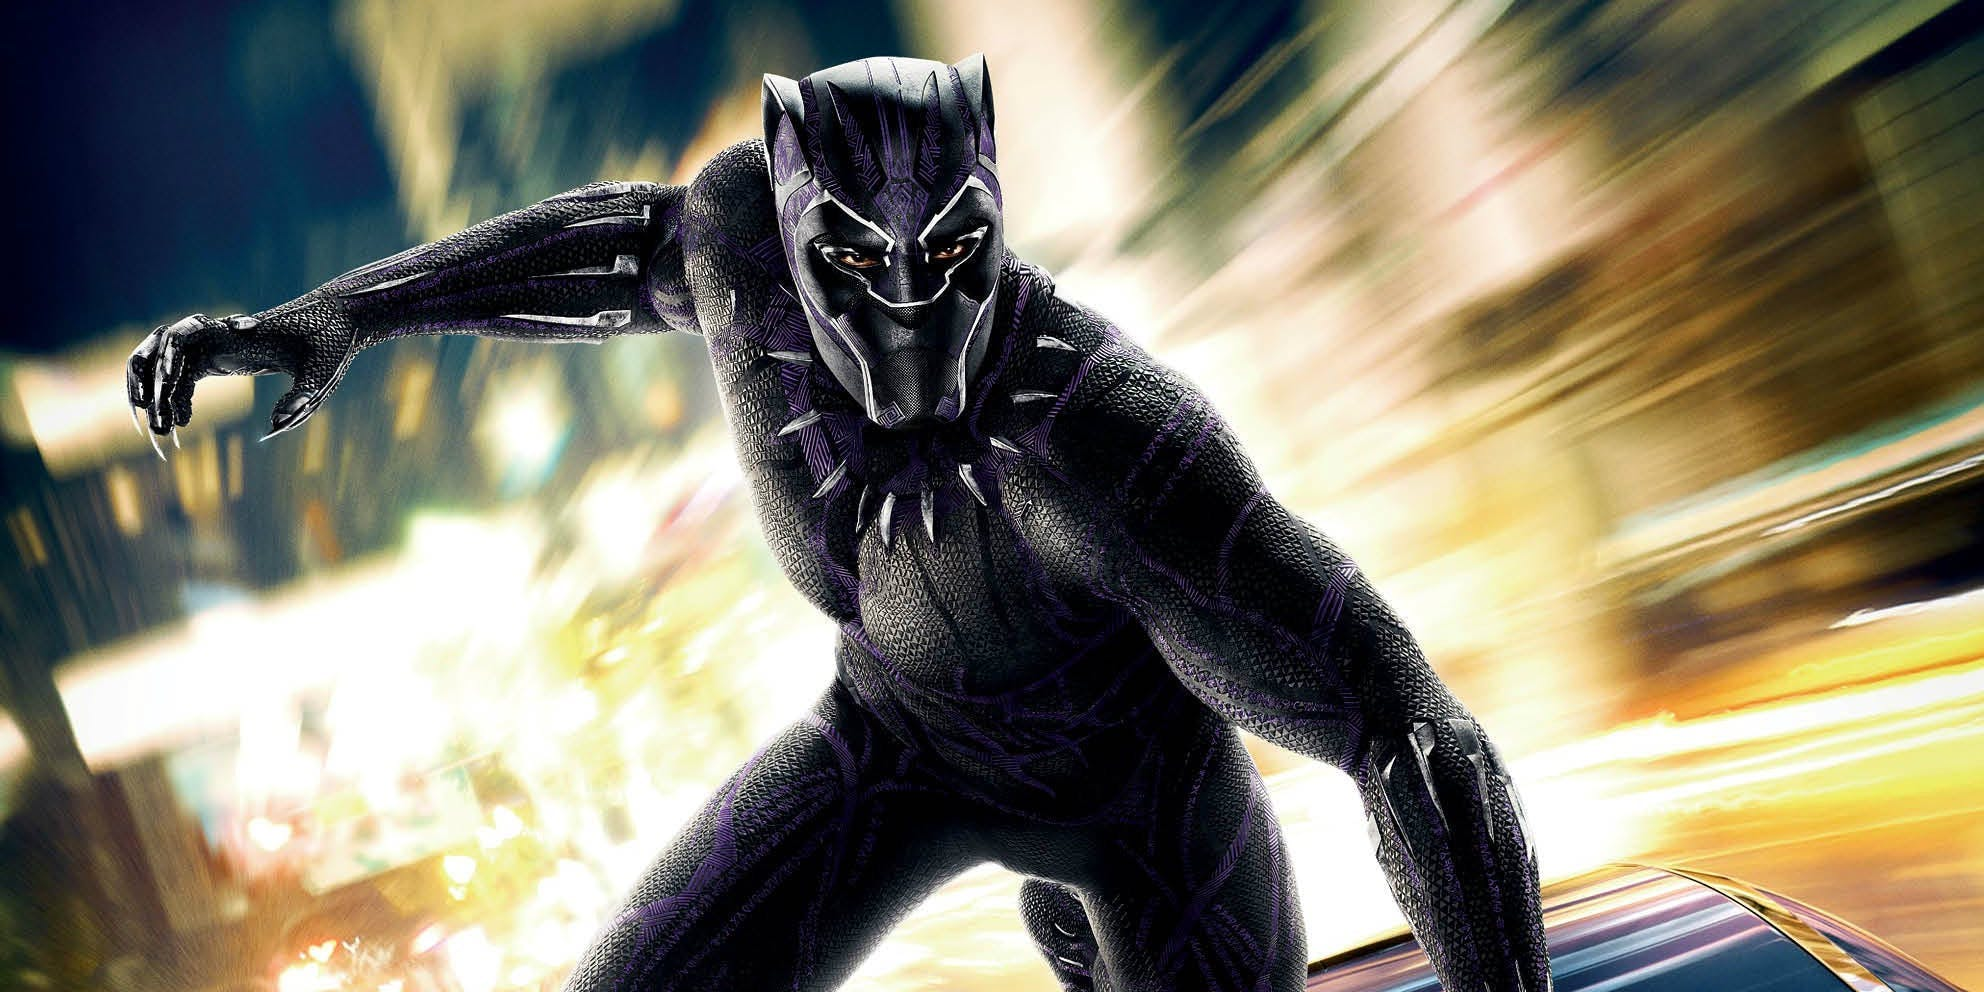 Black-Panther-Poster-Cropped.jpg